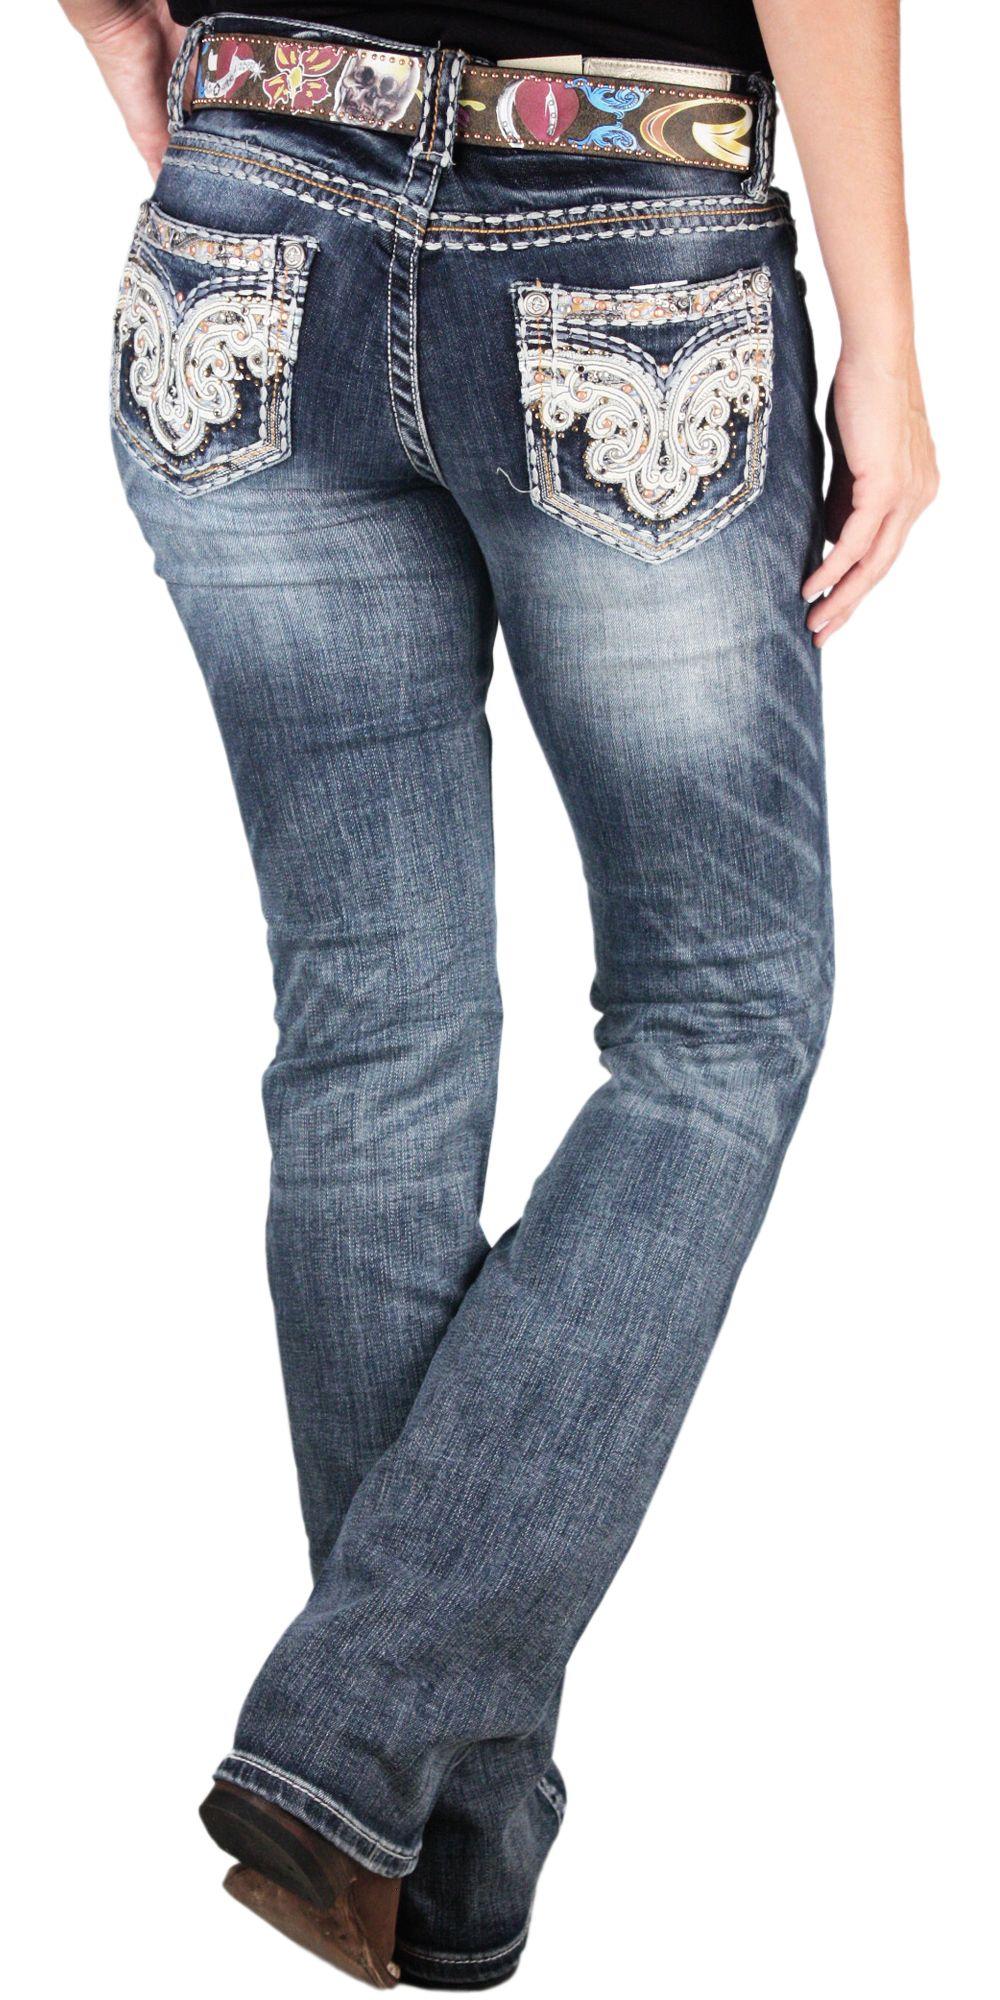 Calça Grace In La Feminina Importada Paisley Pockets Azul Escuro Boot Cut  Calça Grace In La 14ddce16072